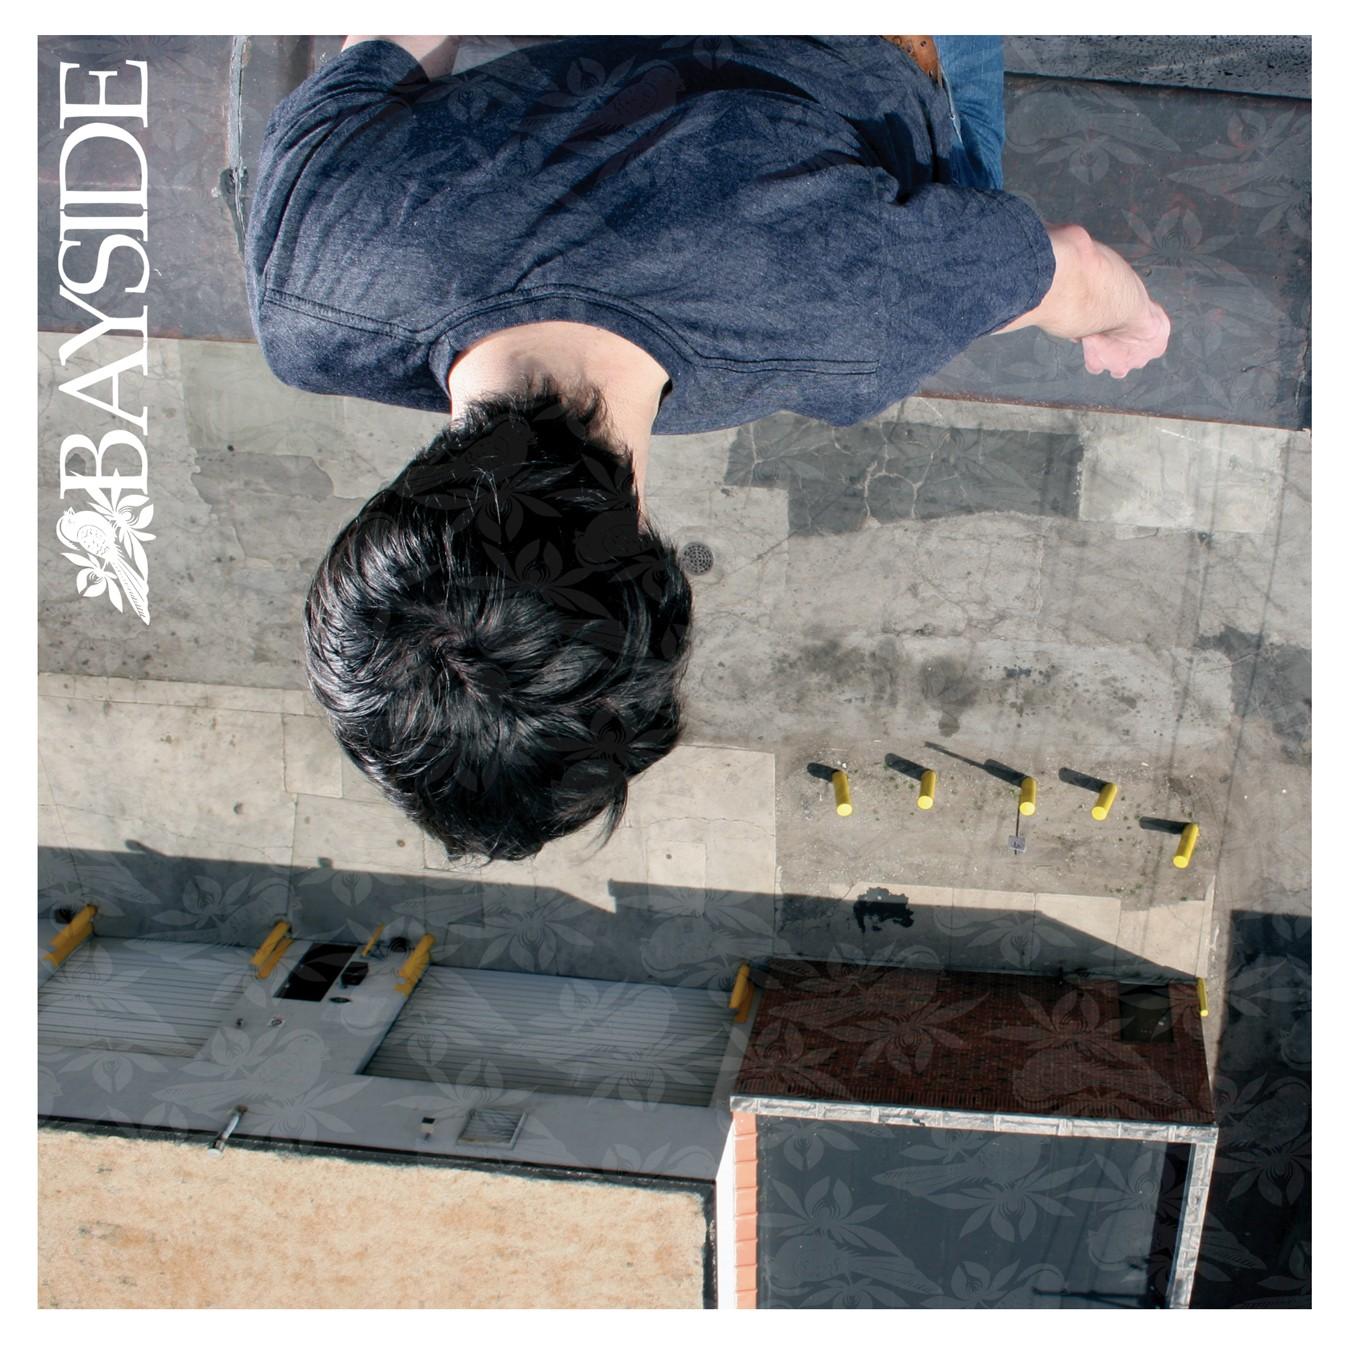 Bayside - Bayside LP